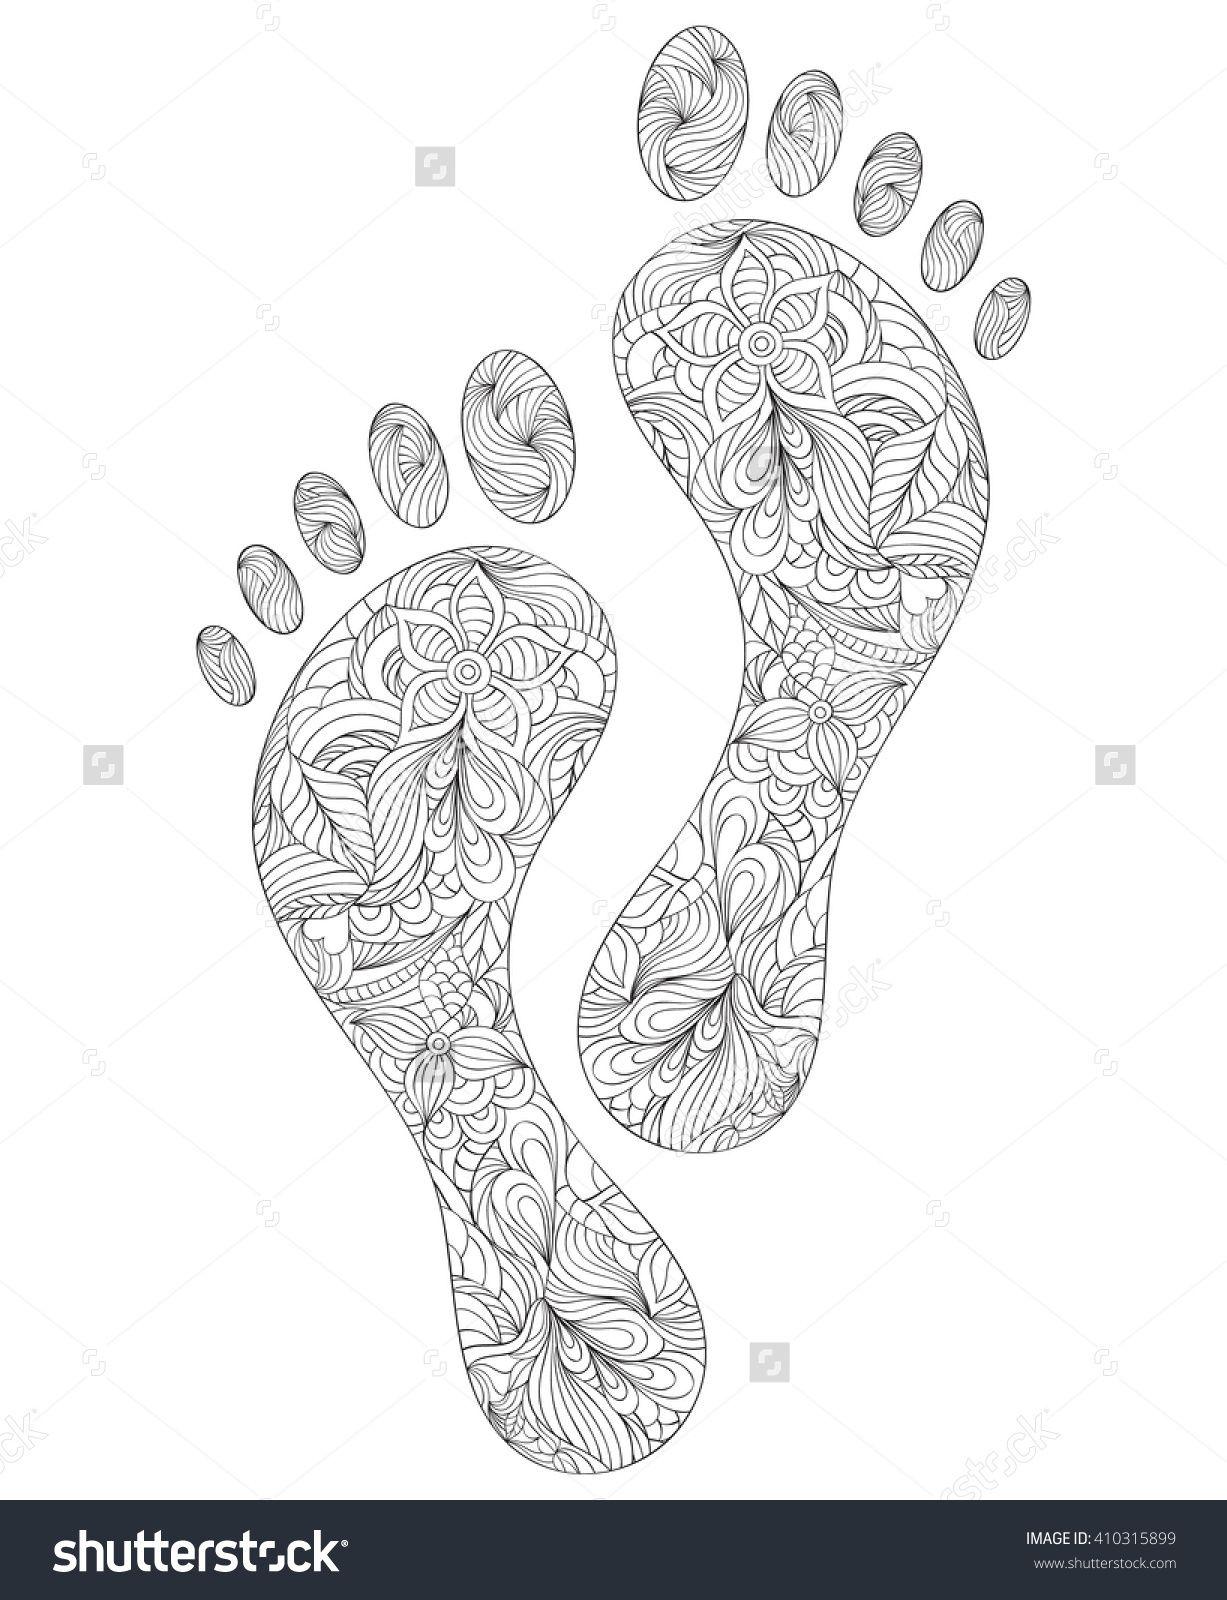 Vector Illustration Floral Human Footprints On Stock Vector (Royalty Free) 410315899